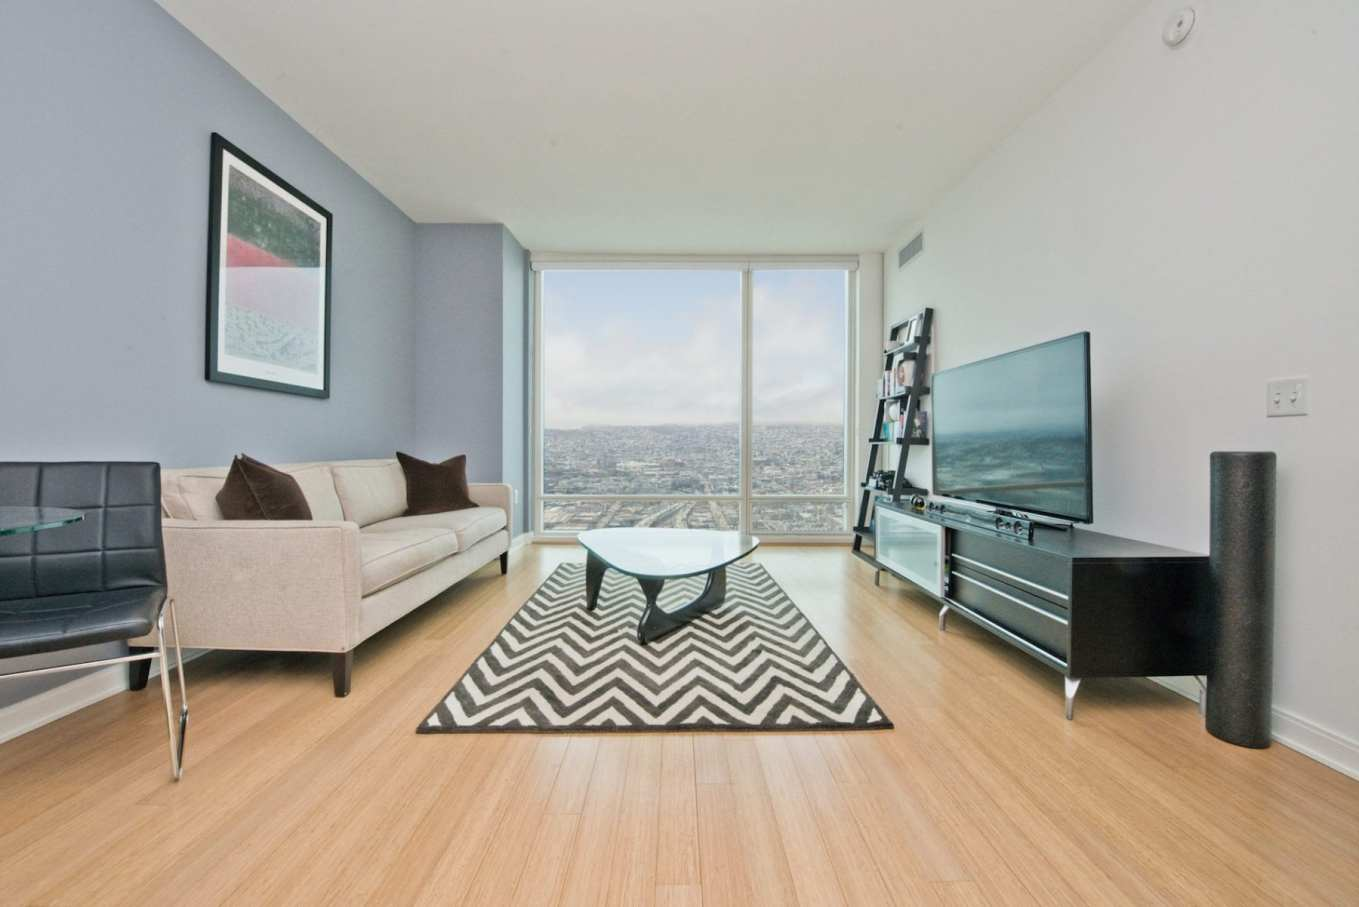 For Sale: 425 1st Street #4605, San Francisco, CA 94105. Photo: Vincent Heung, JODI Group Real Estate.